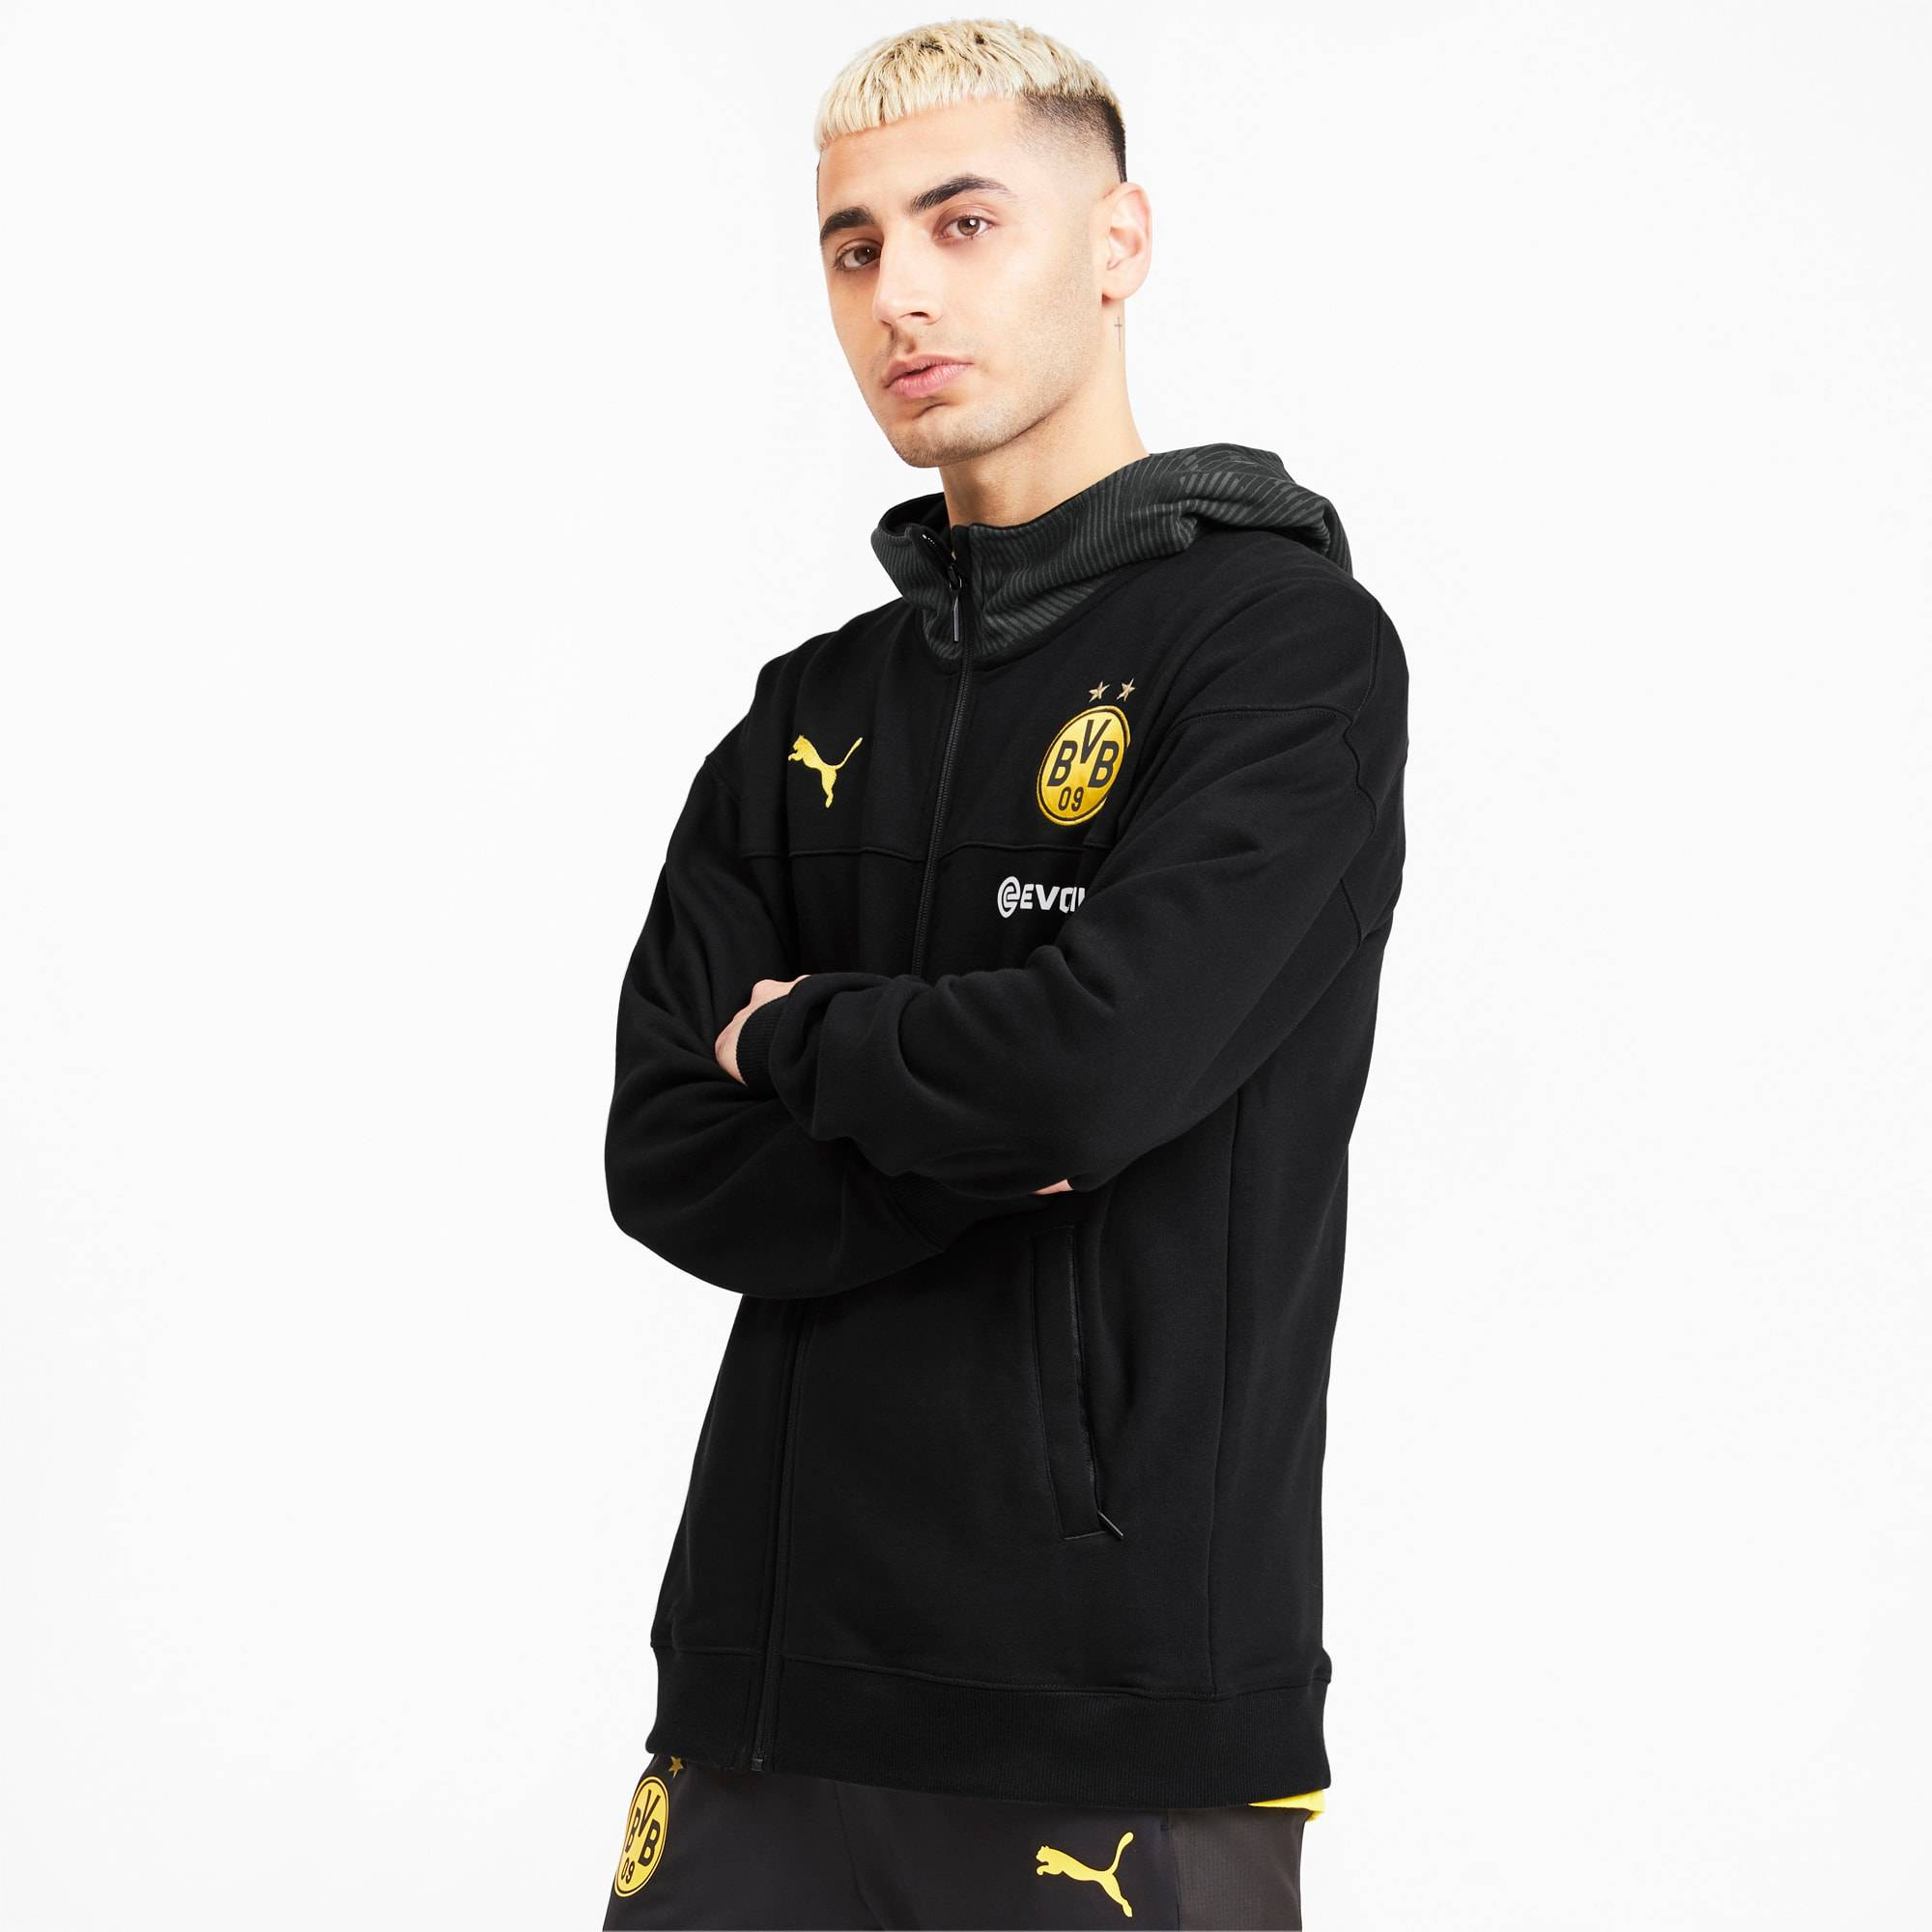 Puma BVB Casuals Men's Jacket,  Black/Phantom Black, size X Small, Clothing